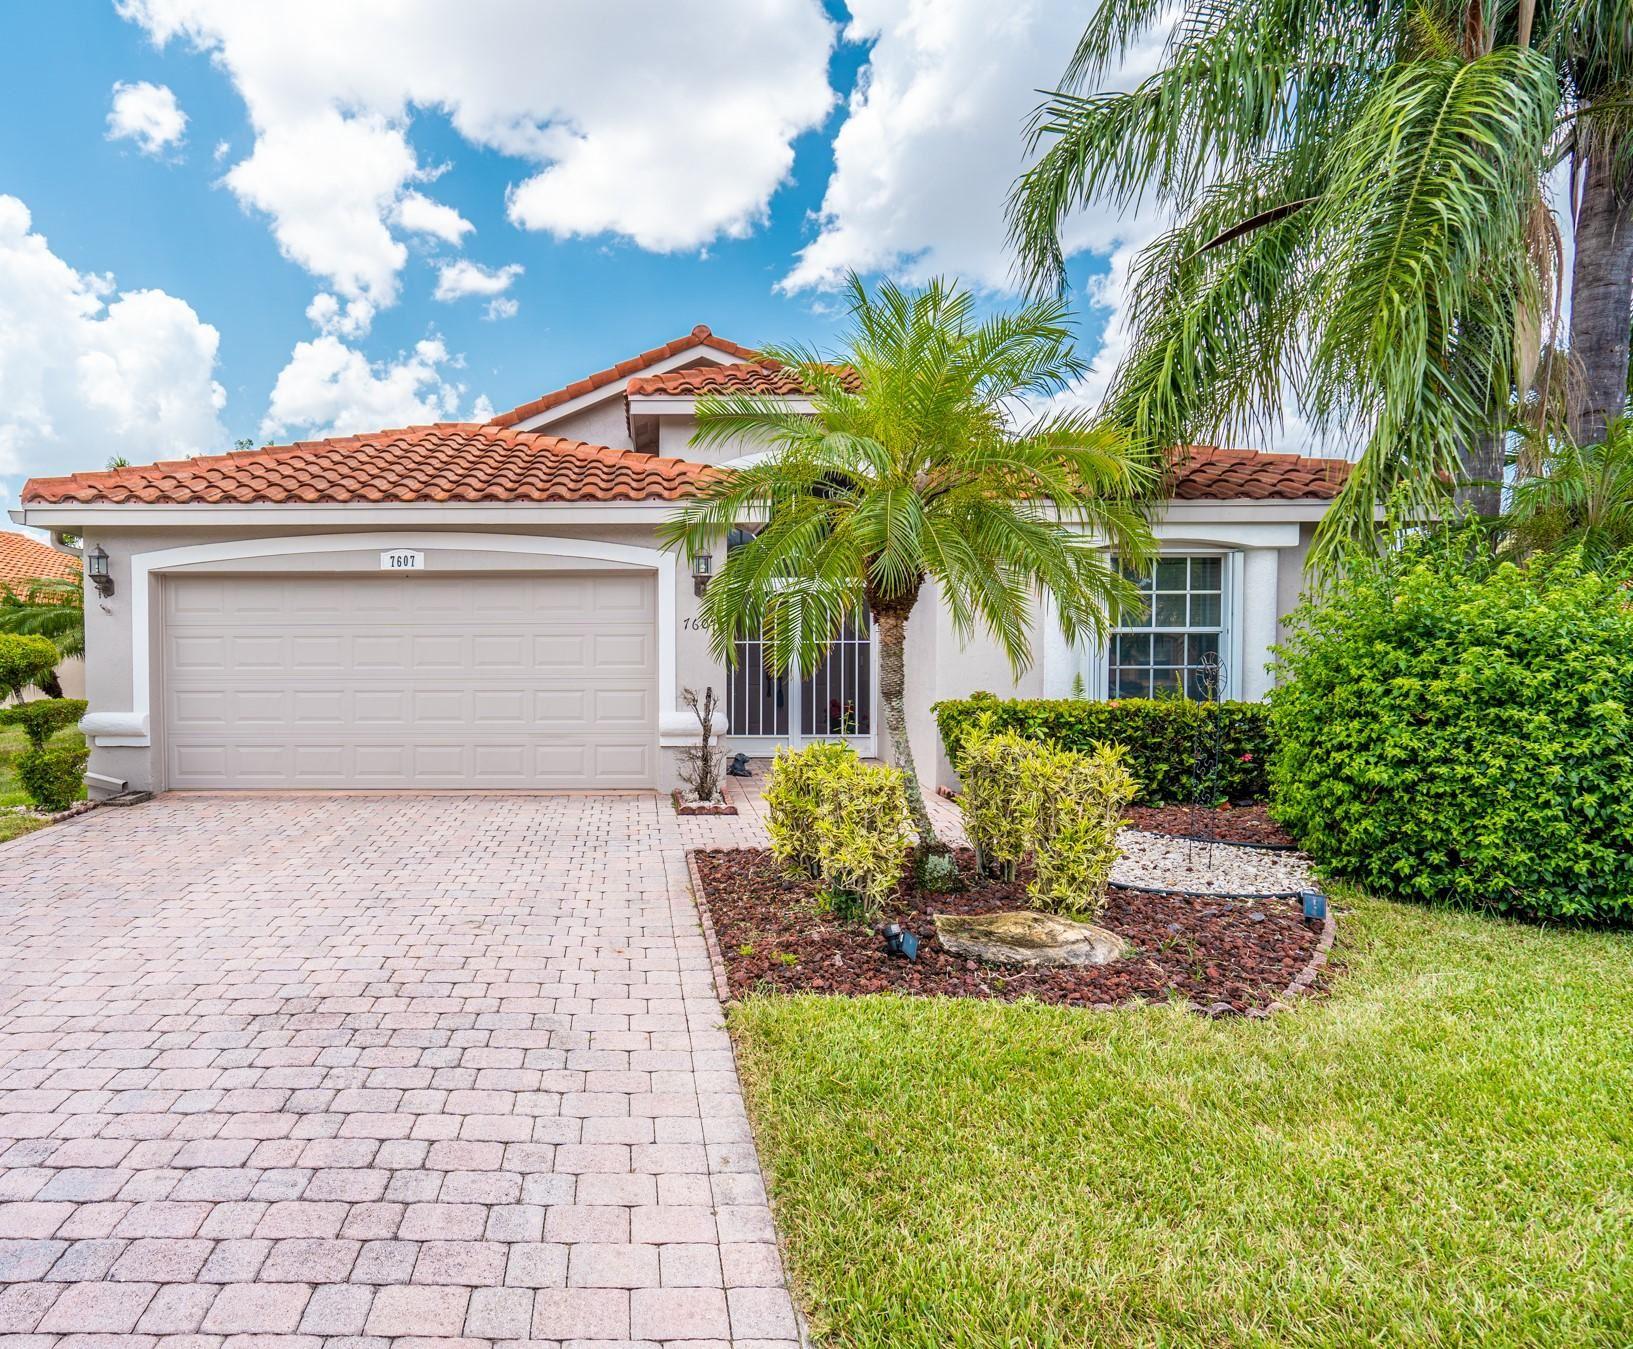 7607 Caprio Drive, Boynton Beach, FL 33472 - #: RX-10635530